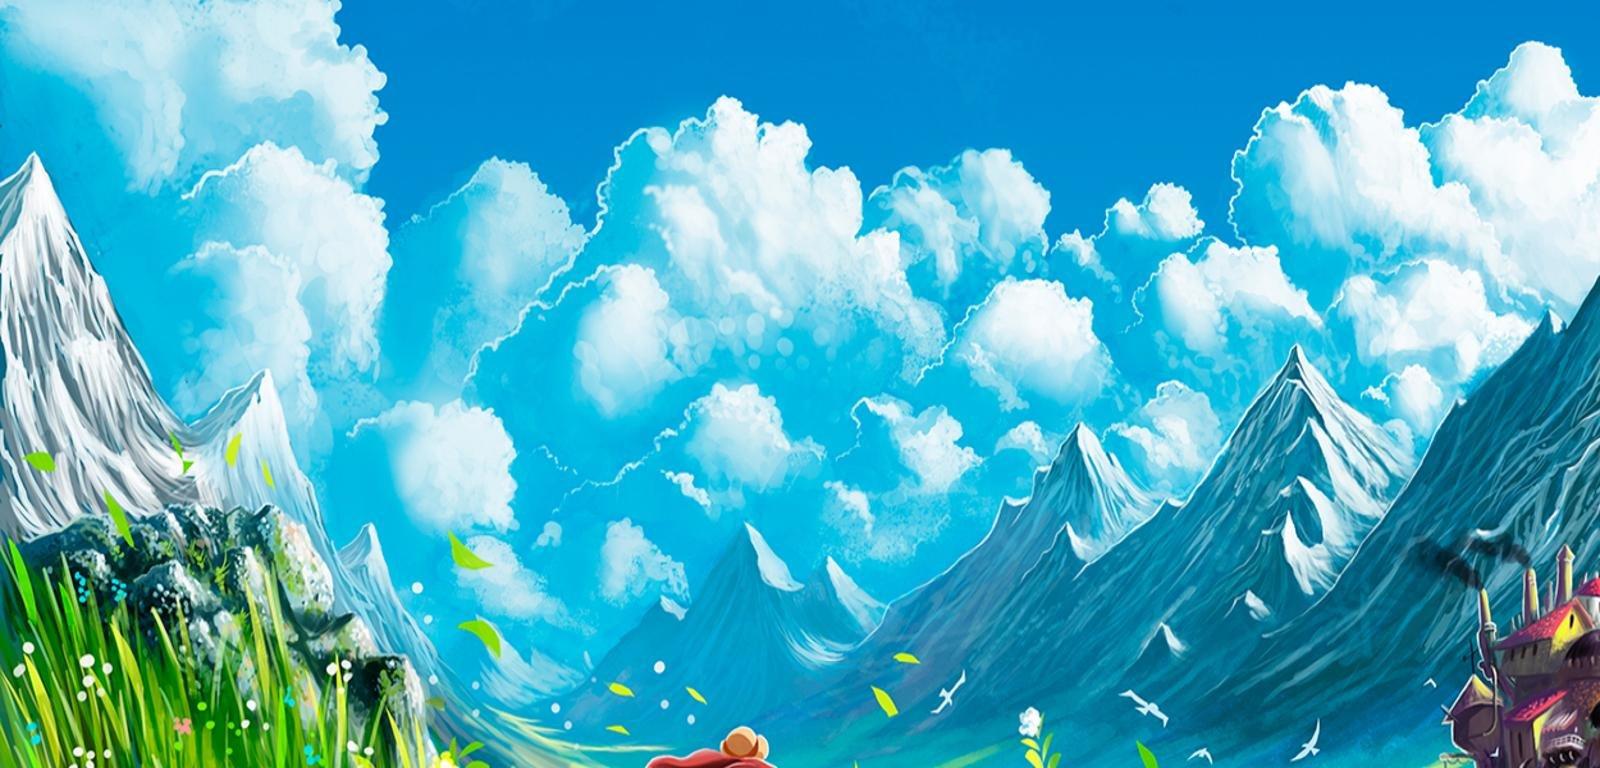 Howls Moving Castle Twitter Header 435267 Hd Wallpaper Backgrounds Download